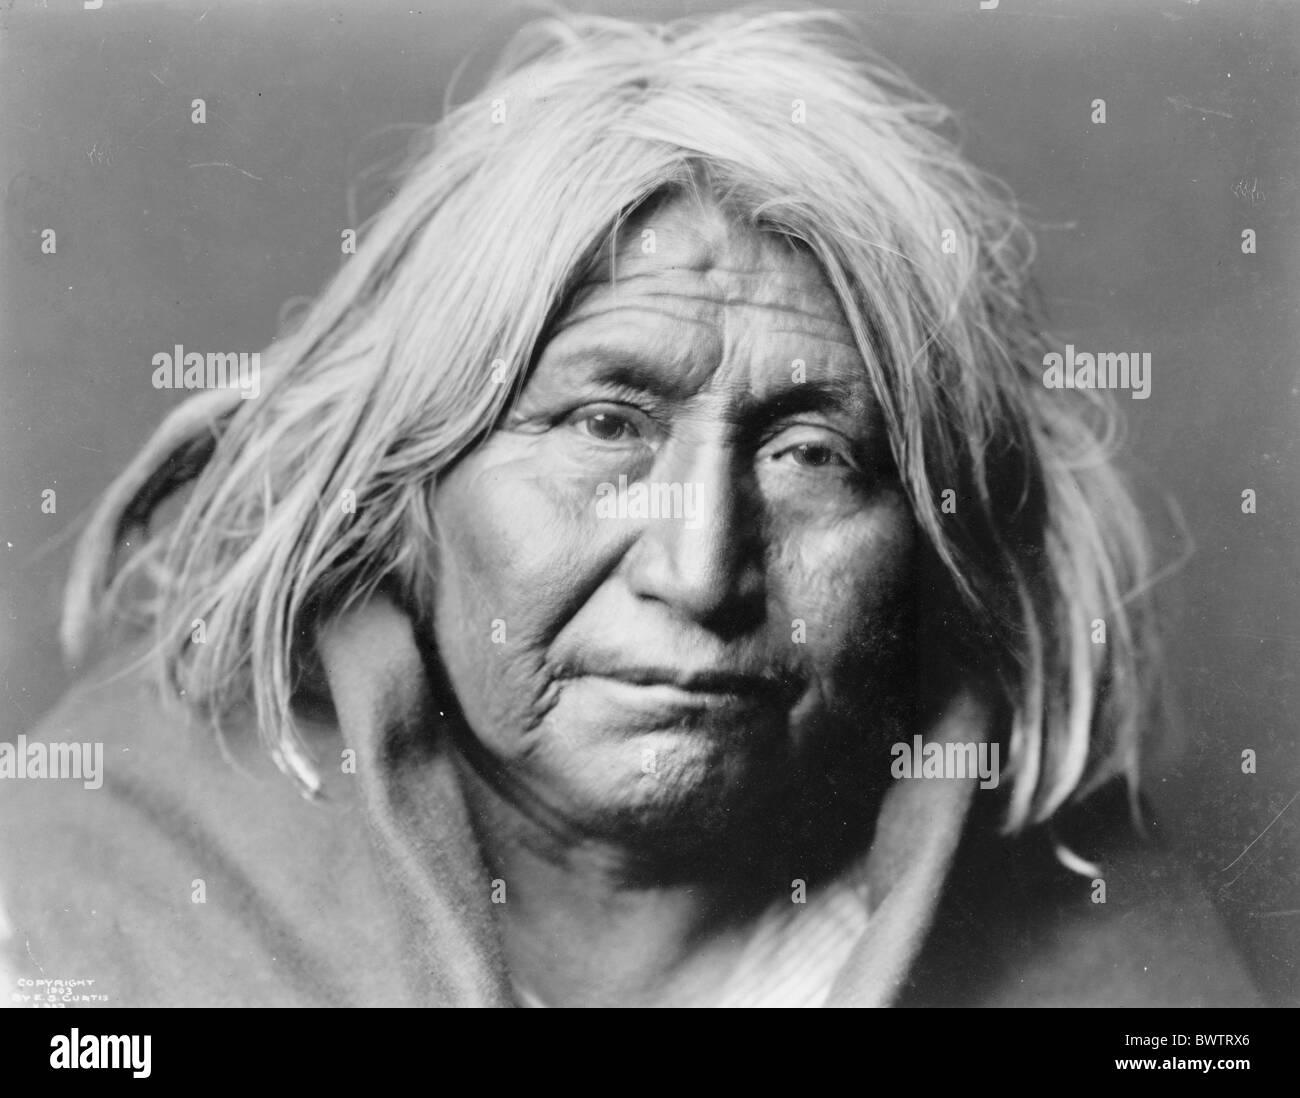 Indian USA America United States North America Portrait Apache 1903 redskin historical historic history ma - Stock Image